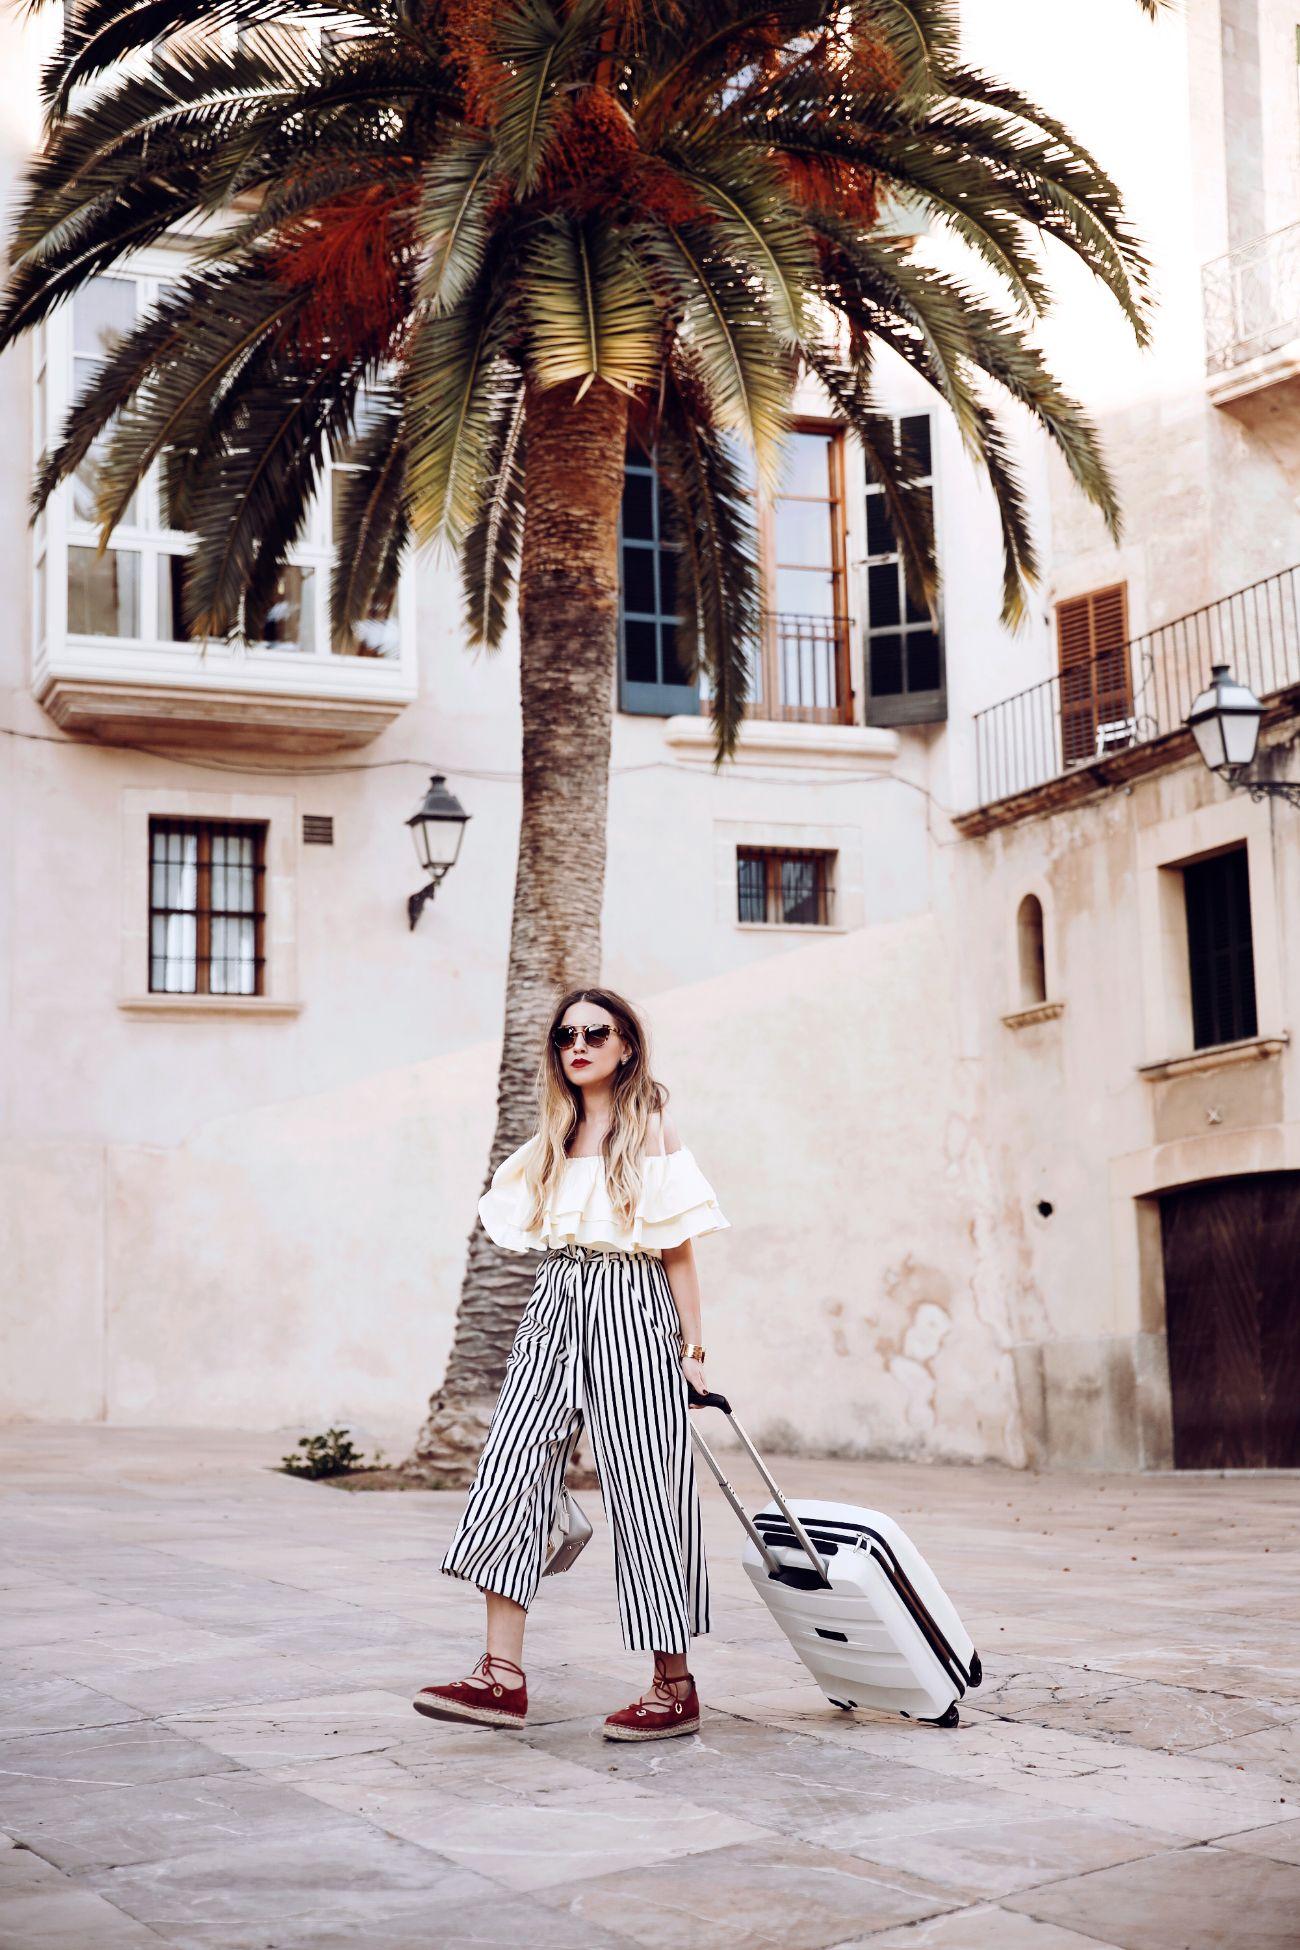 Traveling girl & white suitcase 🌴 ☀️@fleurdemode